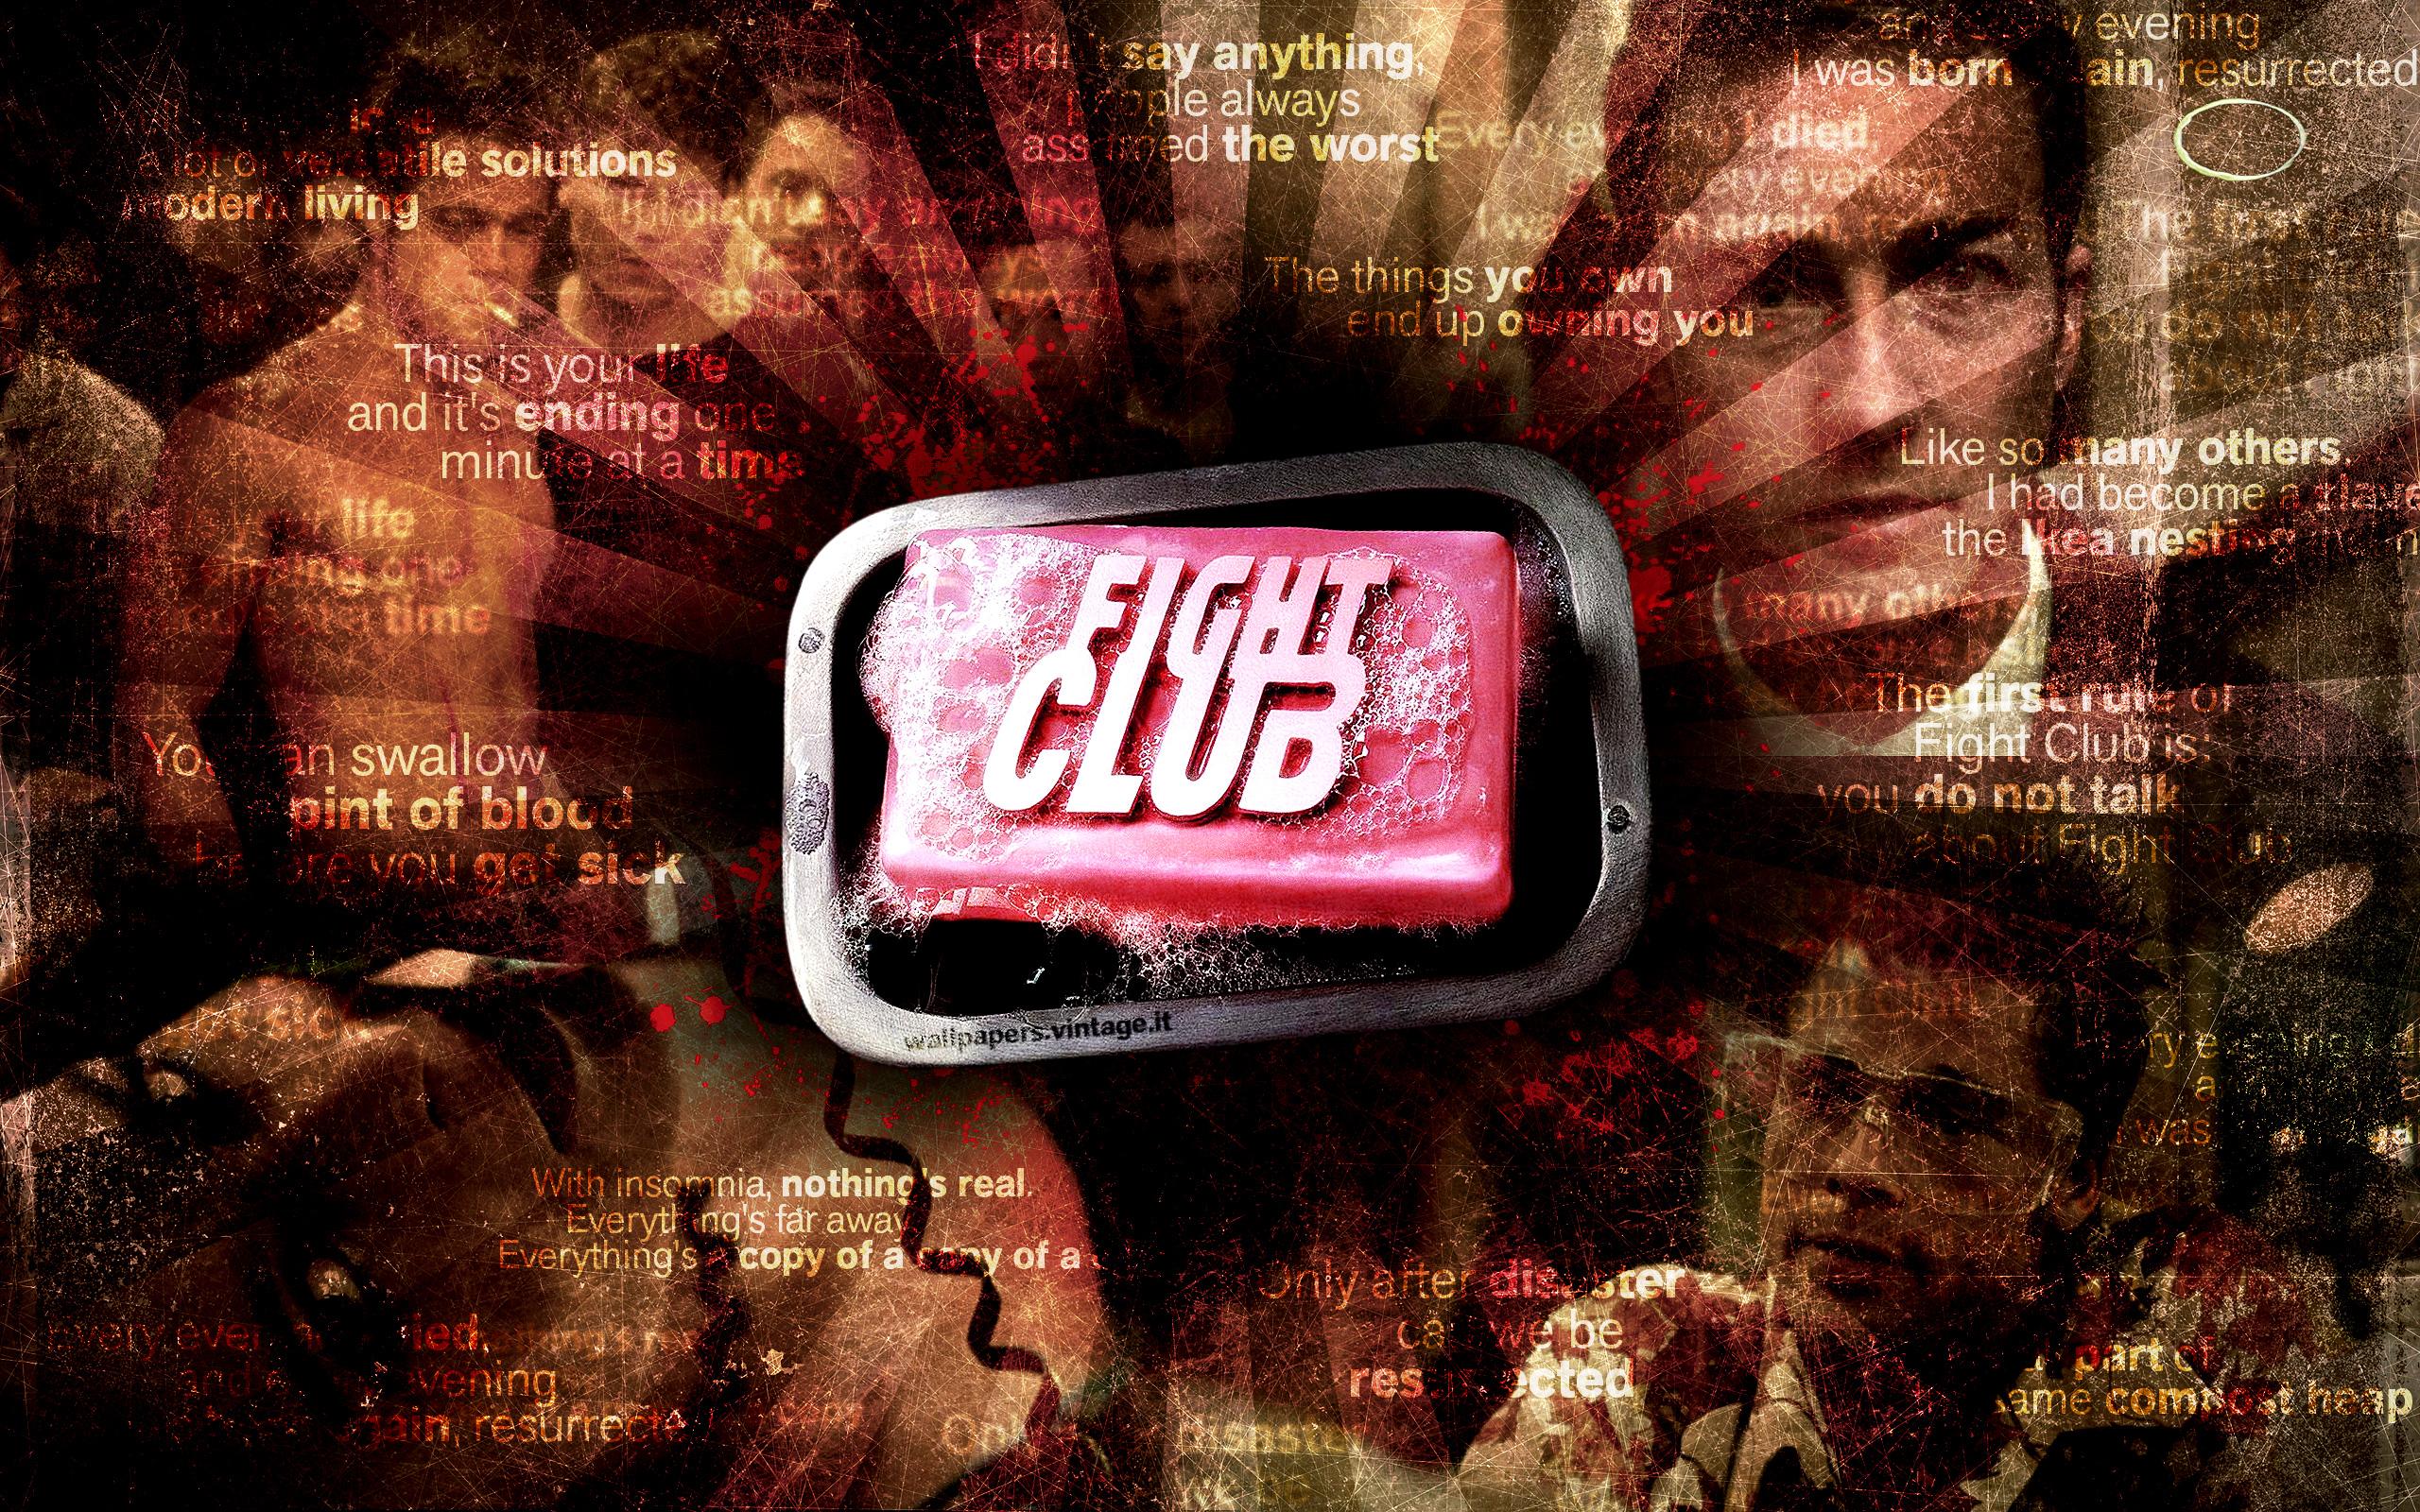 fight club wallpaper free desktop hd ipad iphone wallpapers